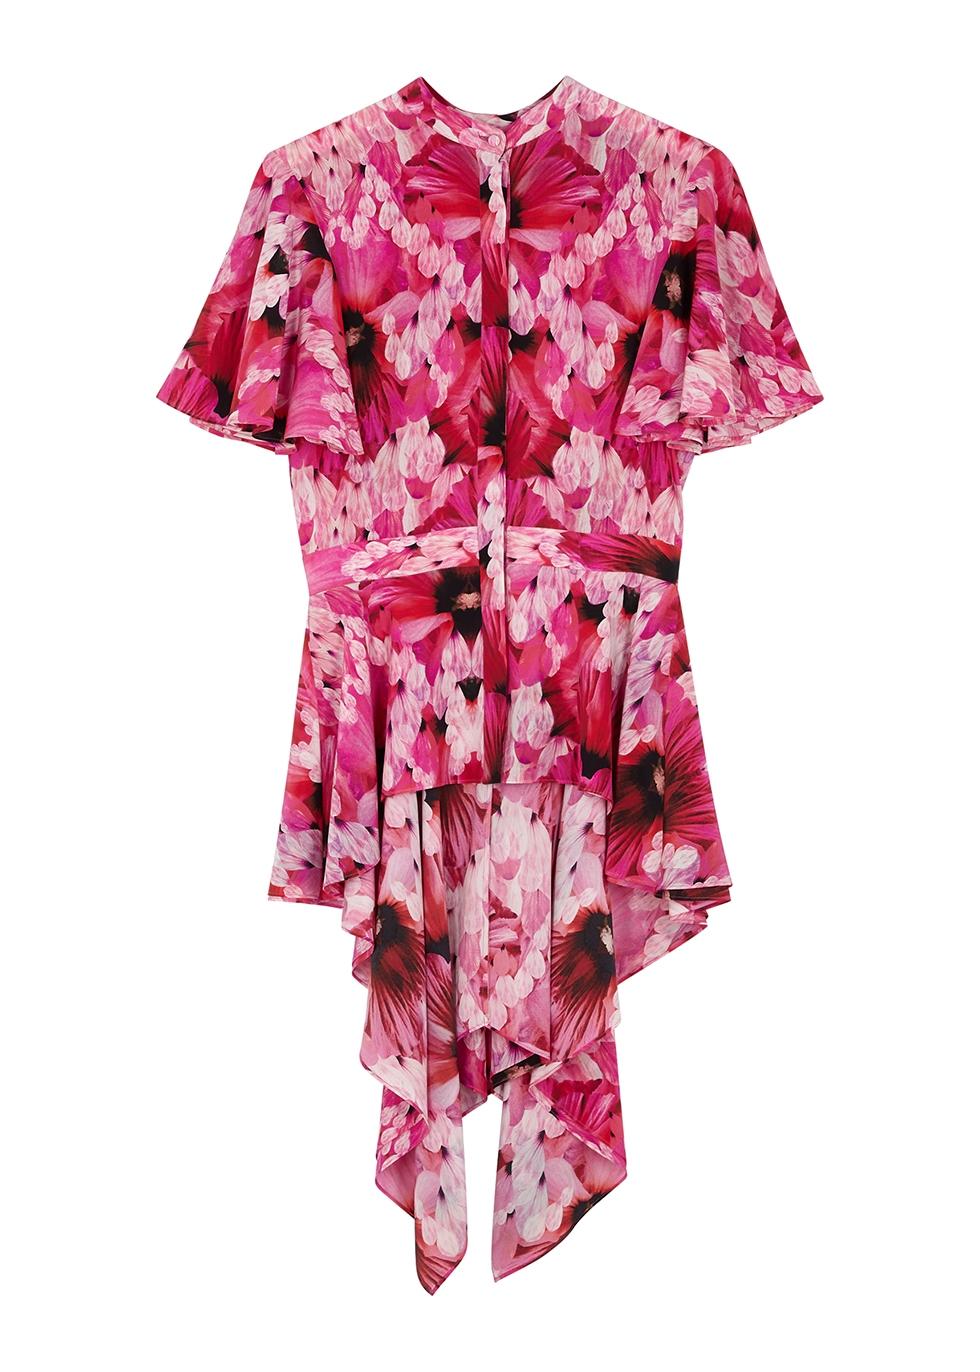 Pink floral-print peplum silk blouse